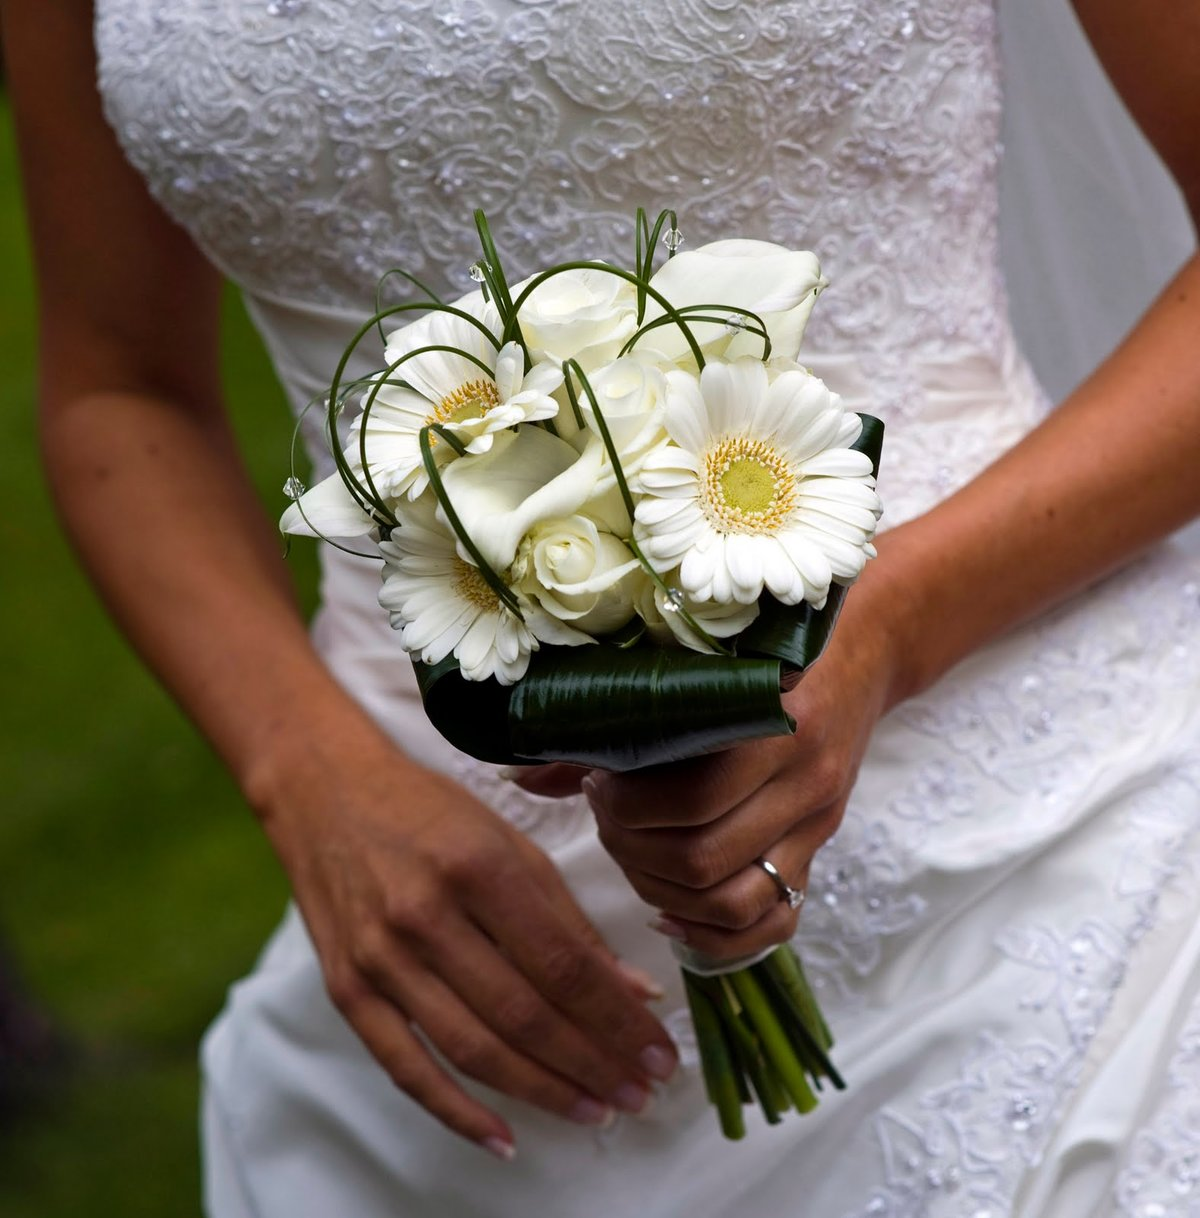 Цветы, скромные свадебные букеты